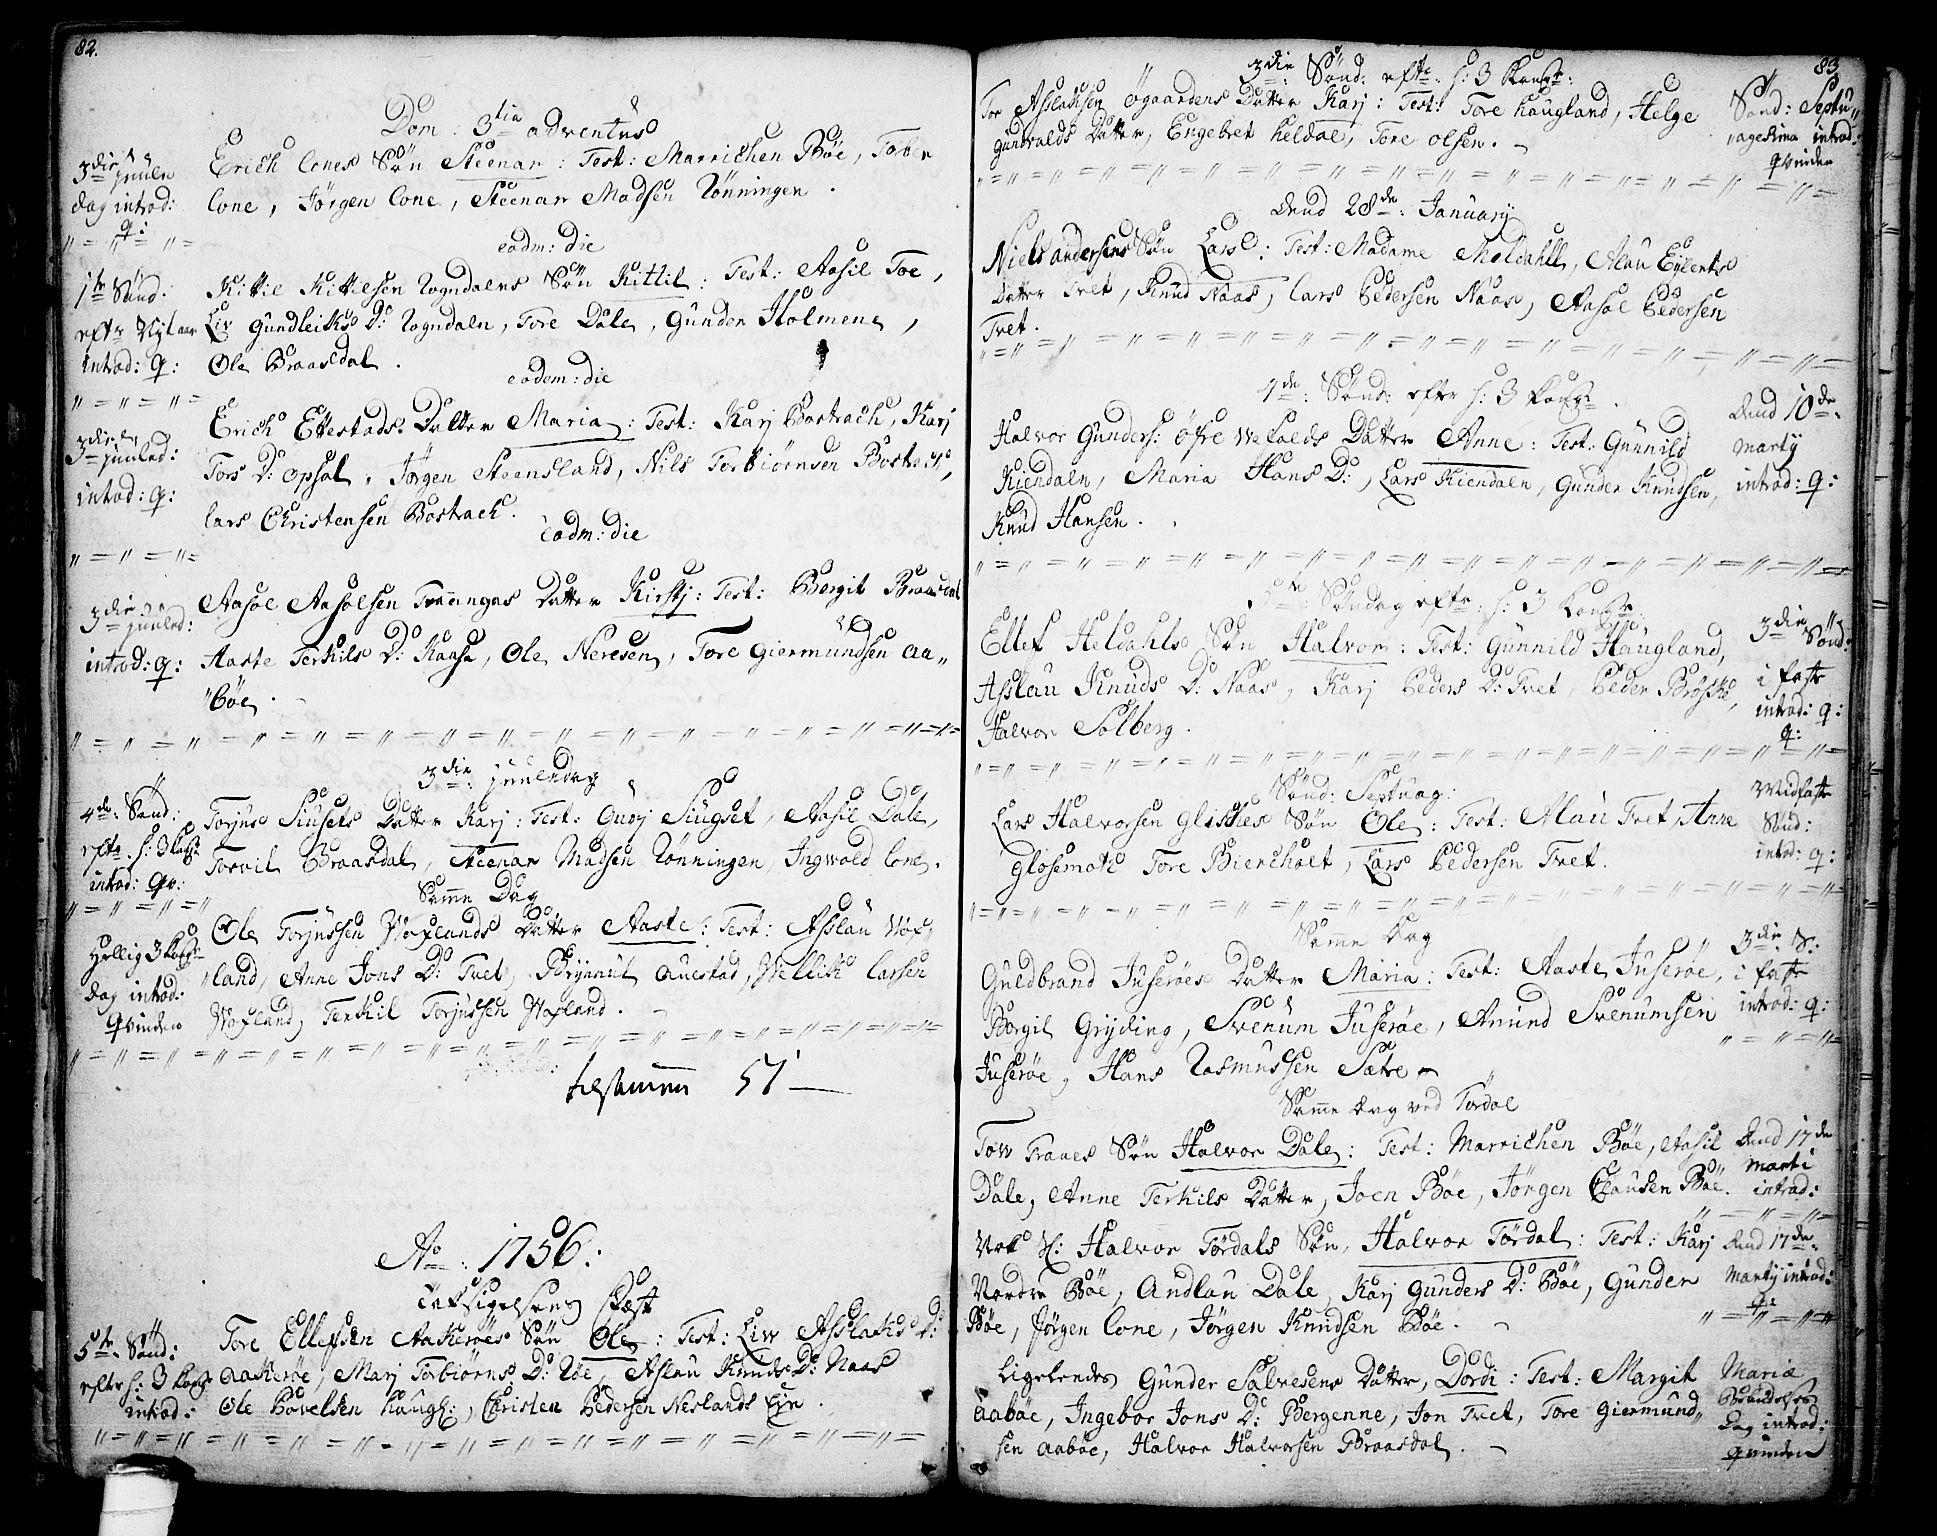 SAKO, Drangedal kirkebøker, F/Fa/L0001: Ministerialbok nr. 1, 1697-1767, s. 82-83